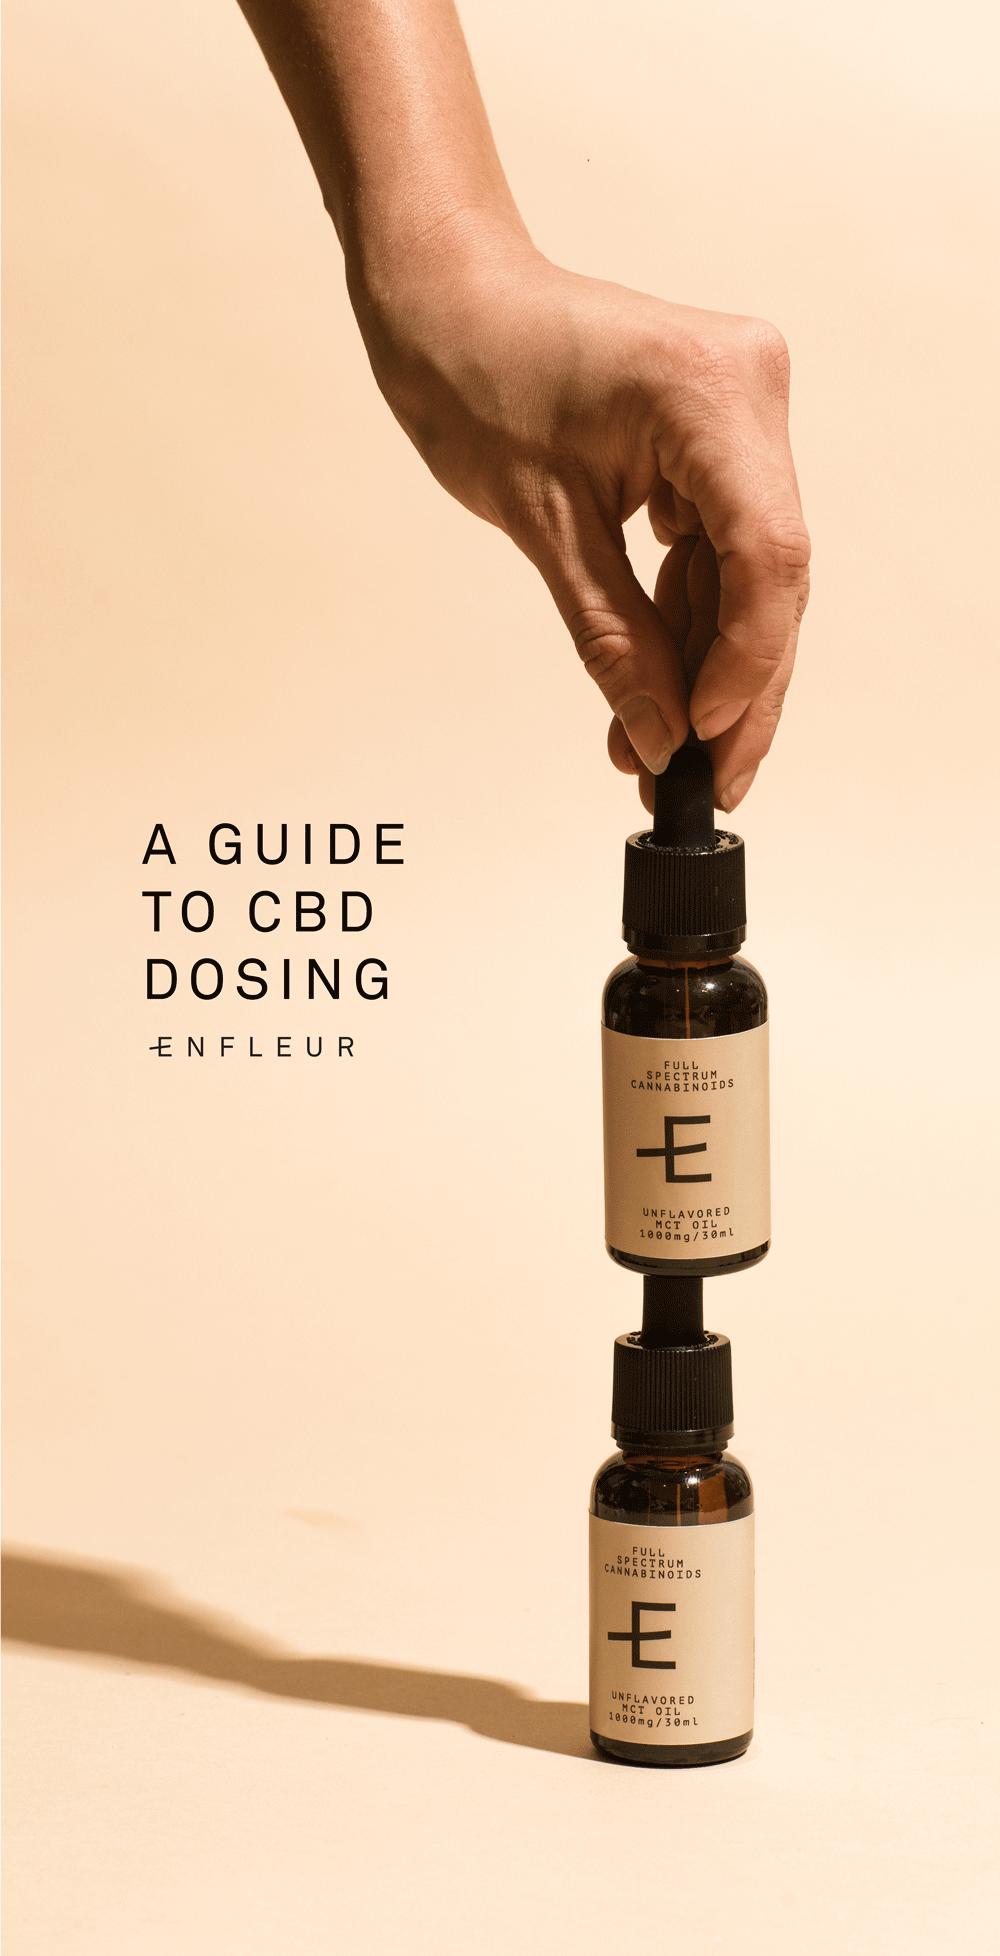 Dosing-guide-enfleur.png